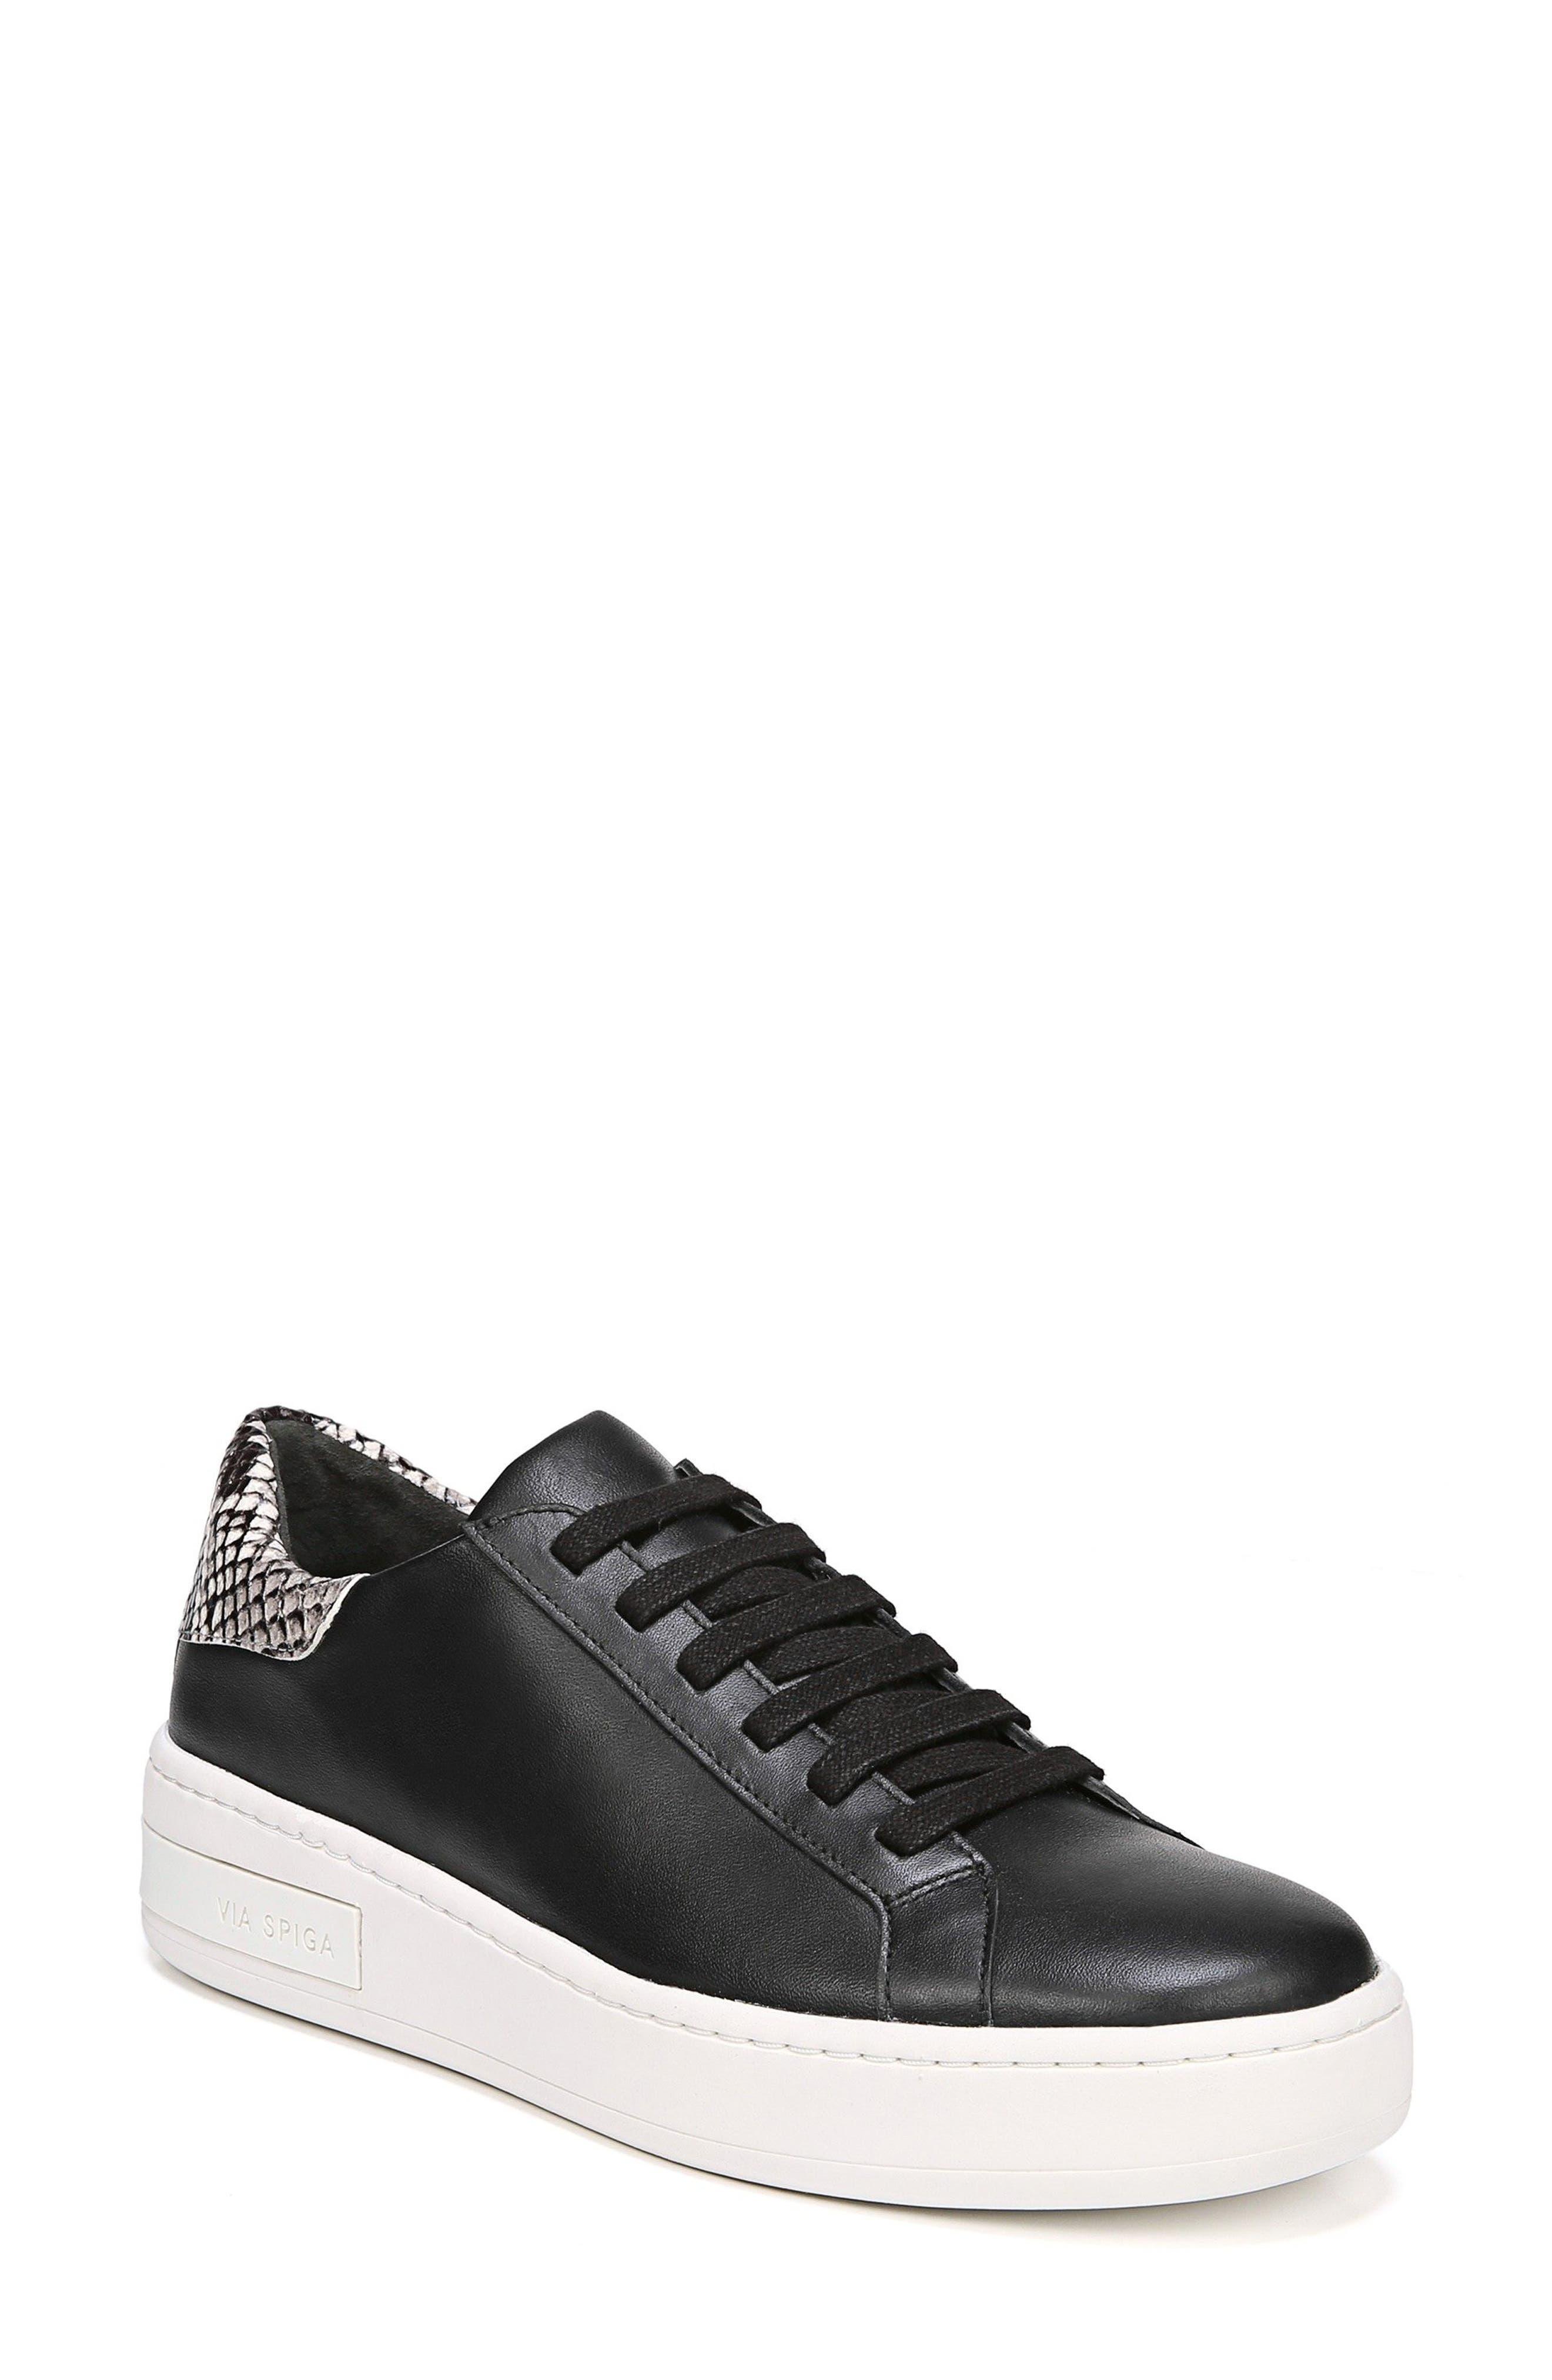 Rylen Platform Sneaker,                             Main thumbnail 1, color,                             BLACK/ BLACK/ WHITE LEATHER